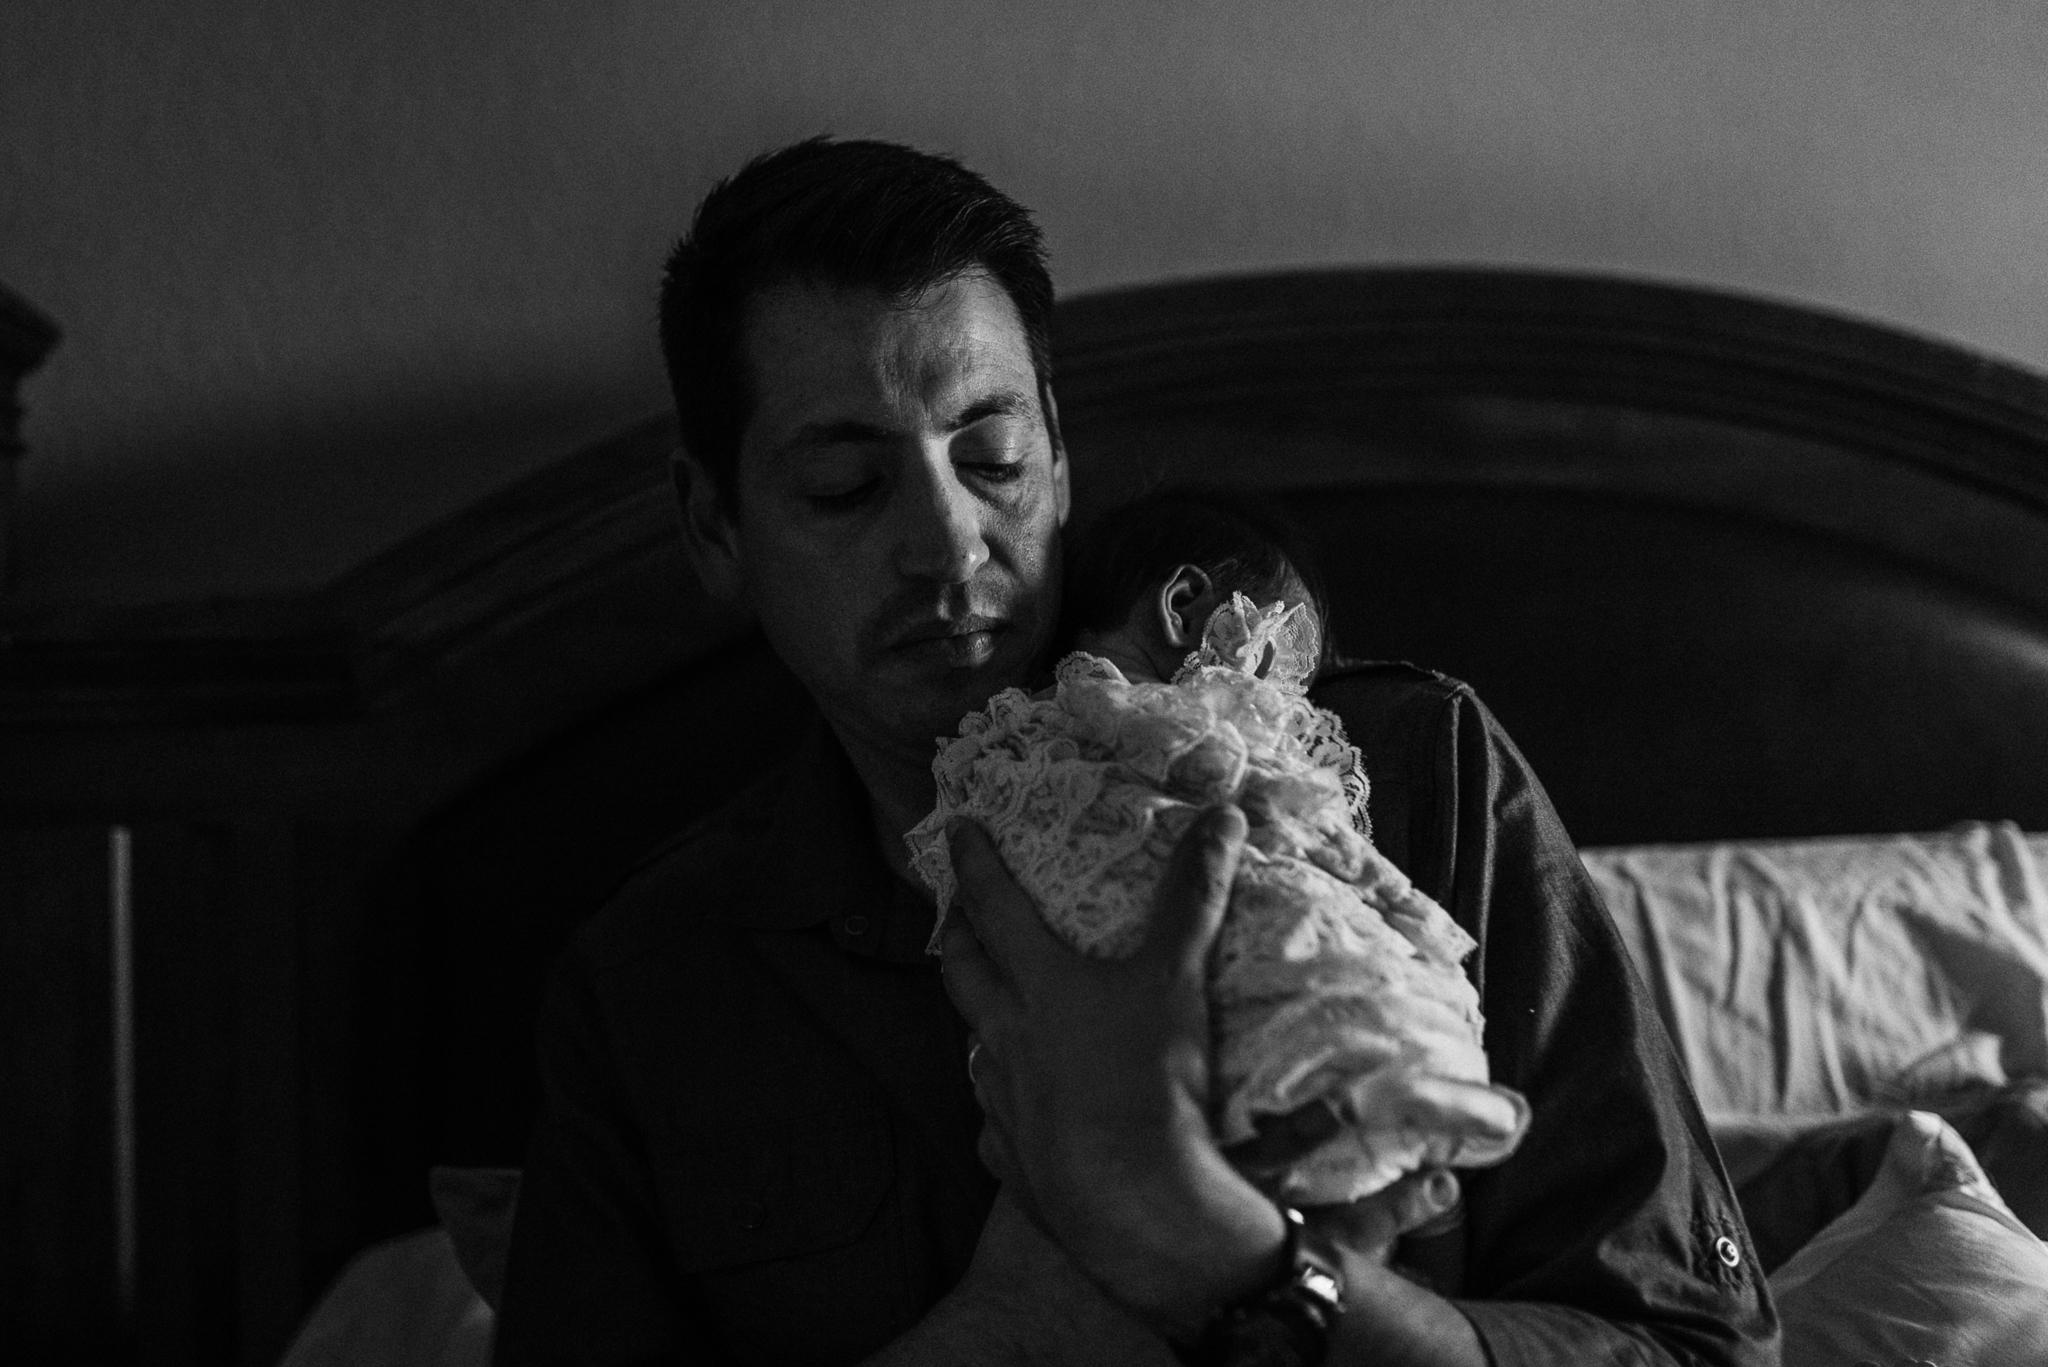 Newborn Photographer_Round Rock Newborn Photographer_Pflugerville Newborn Photographer_Austin Newborn Photographer_Newborn Photography-9.jpg